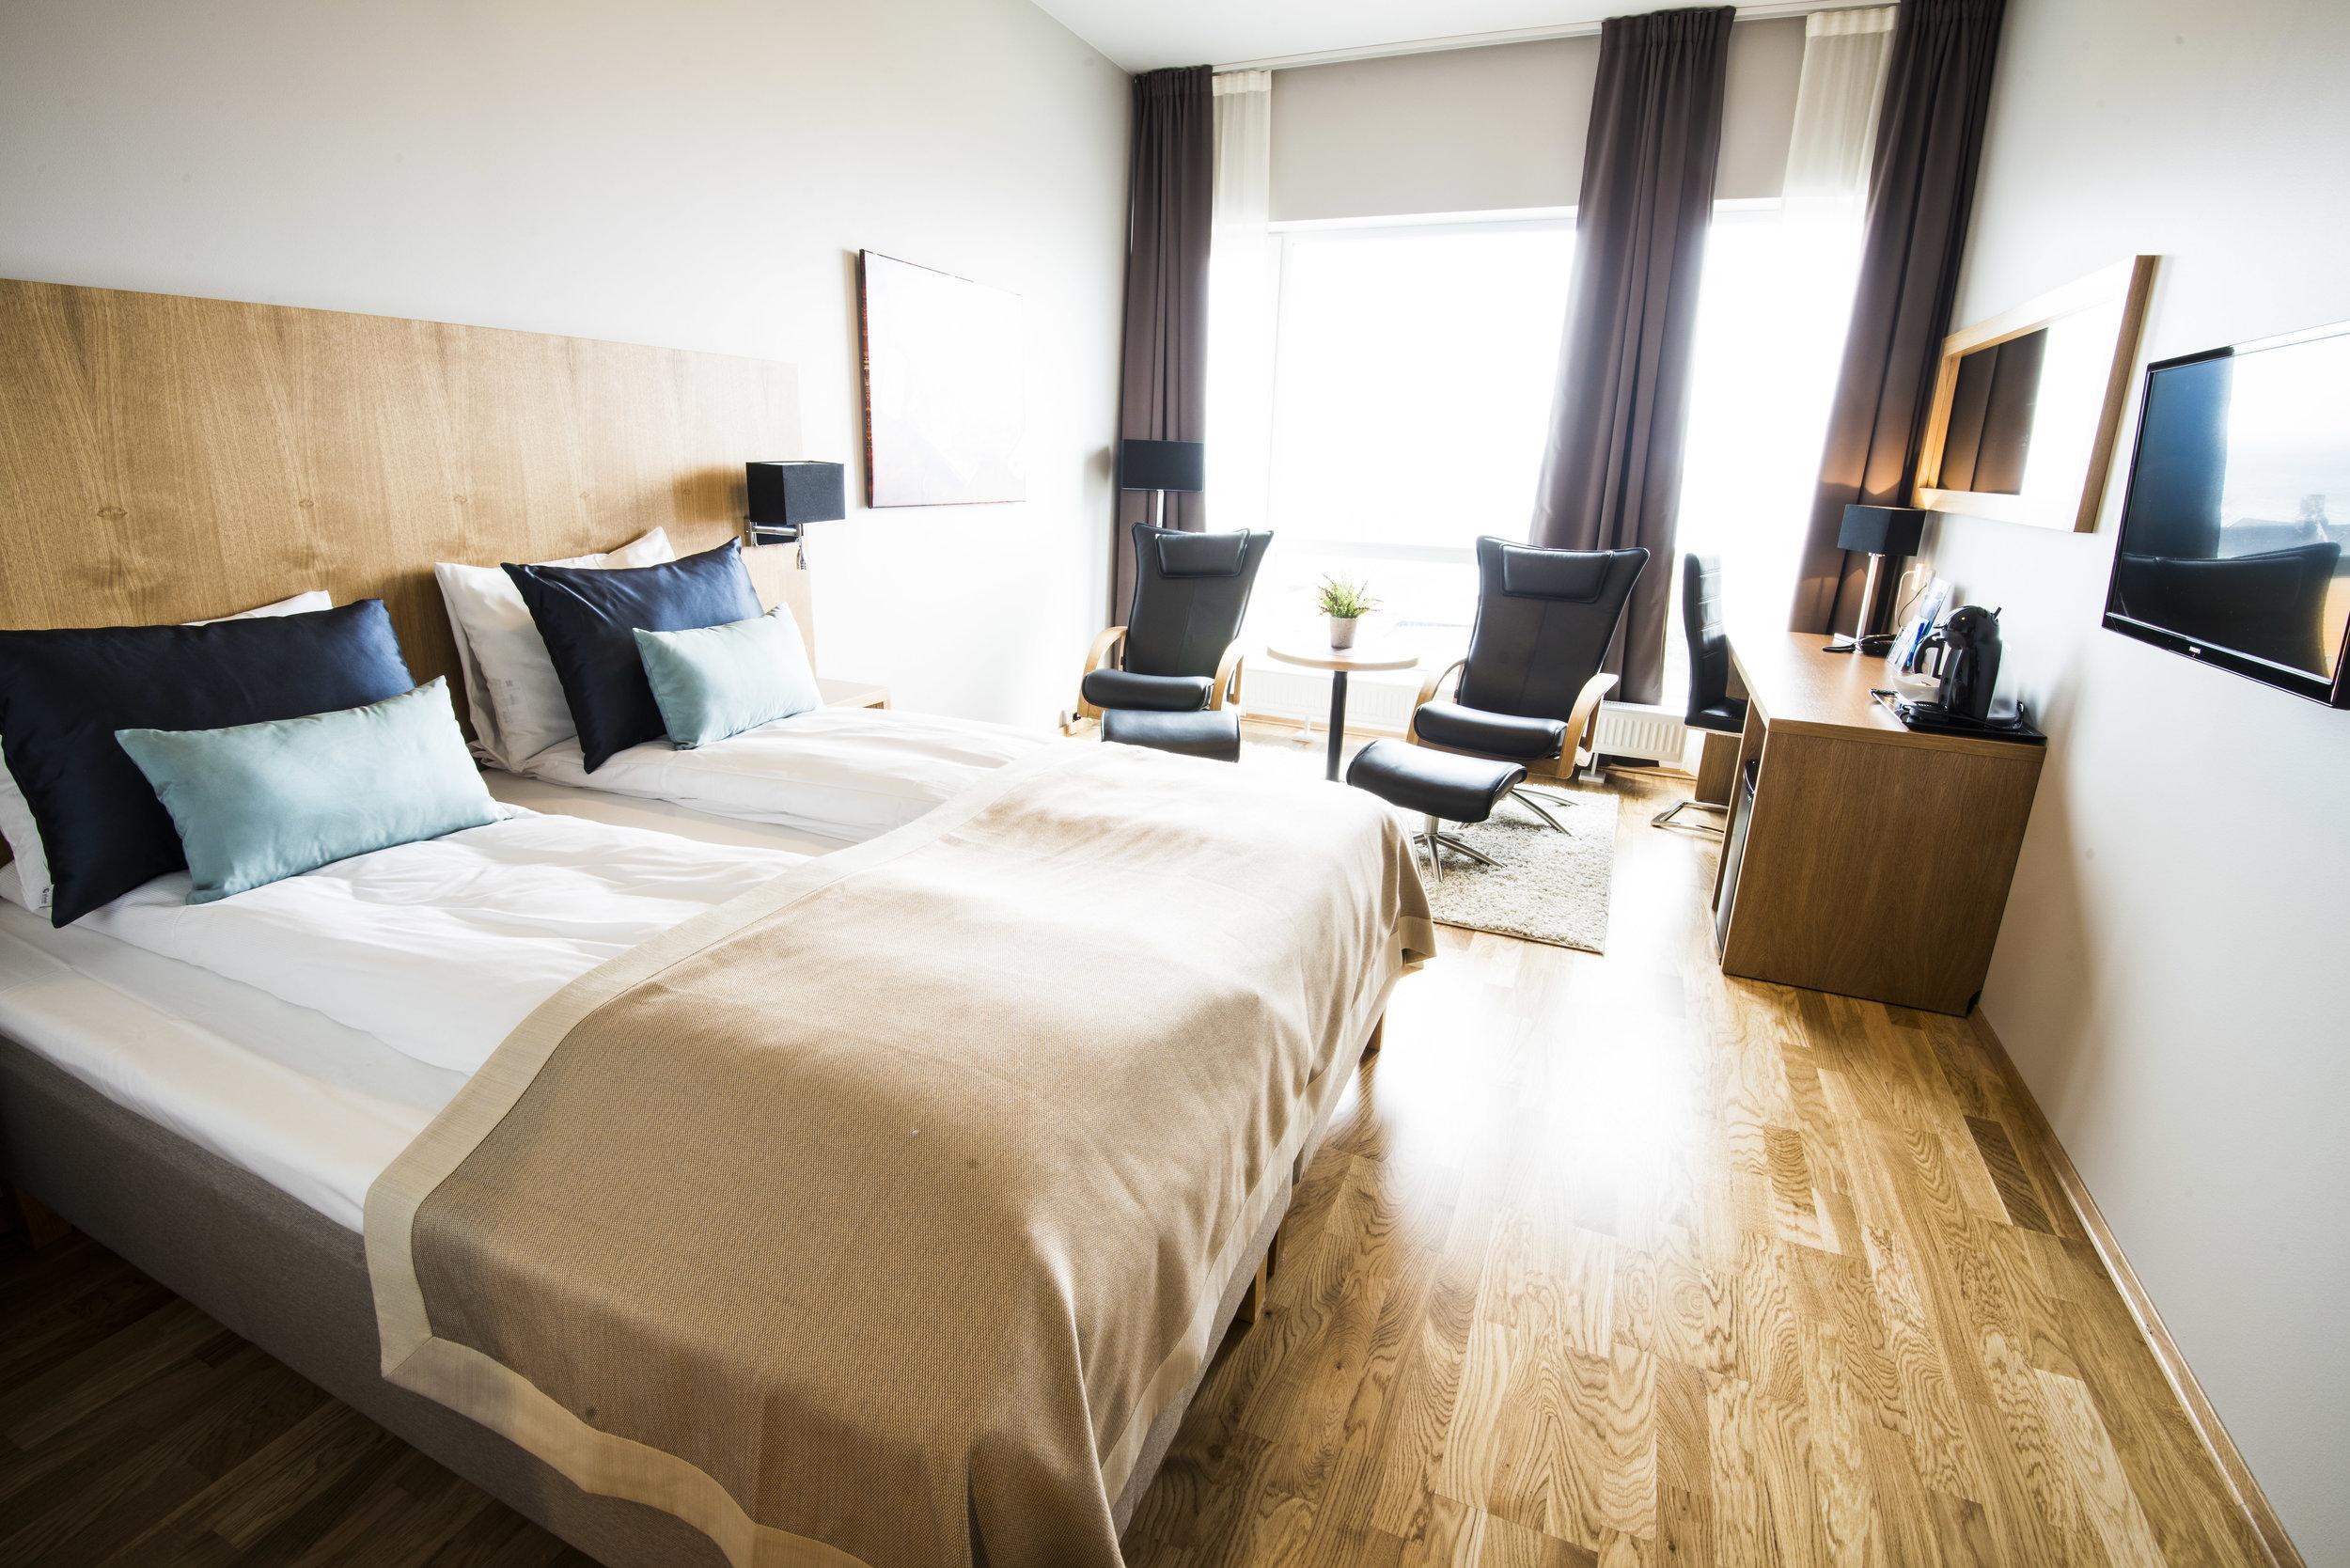 hotellfrøya-8007776.jpg